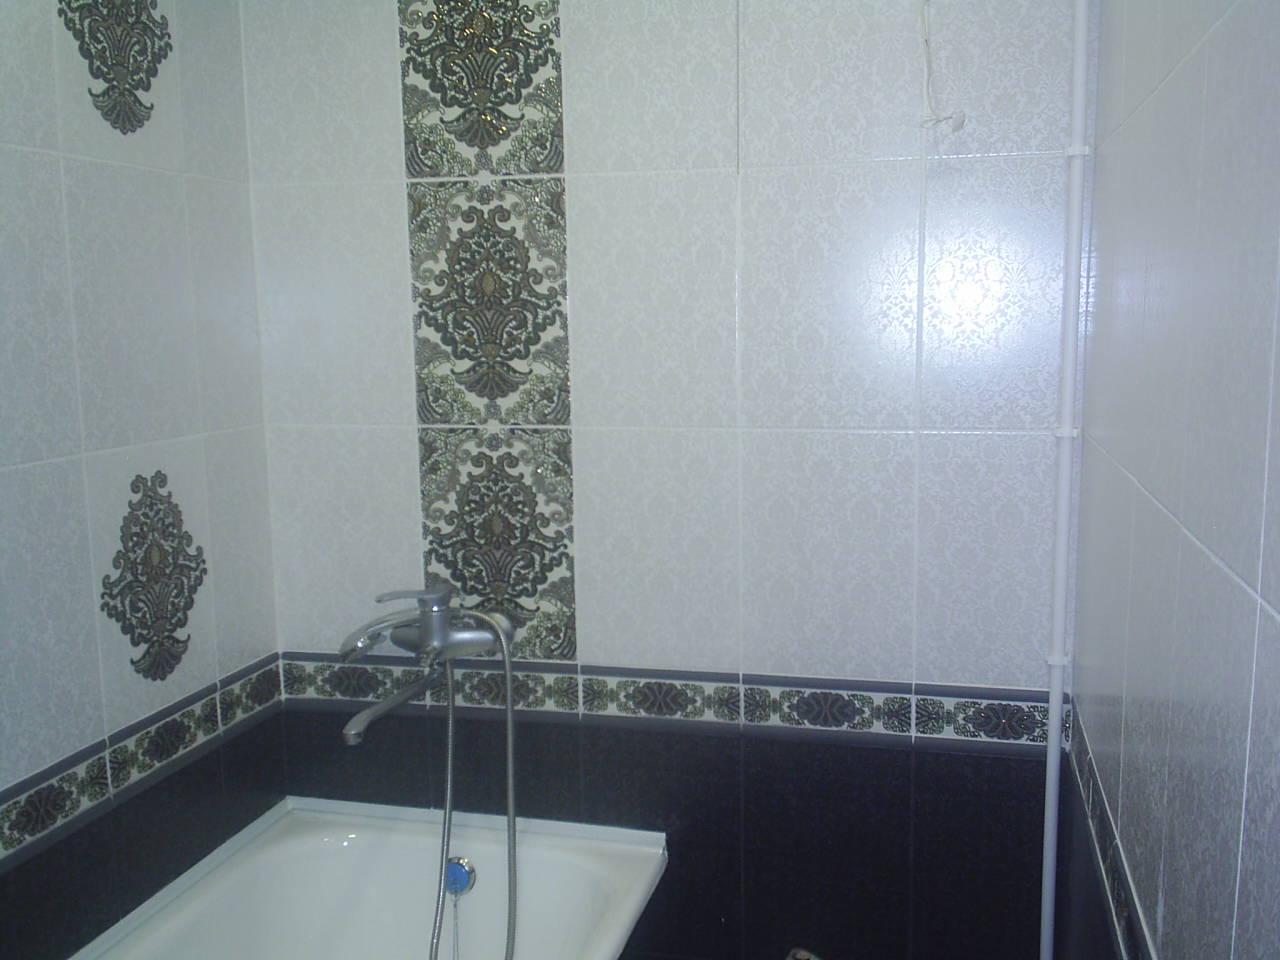 Укладка плитки в Витебске туалет   Керамическая плитка в Витебске   960x1280